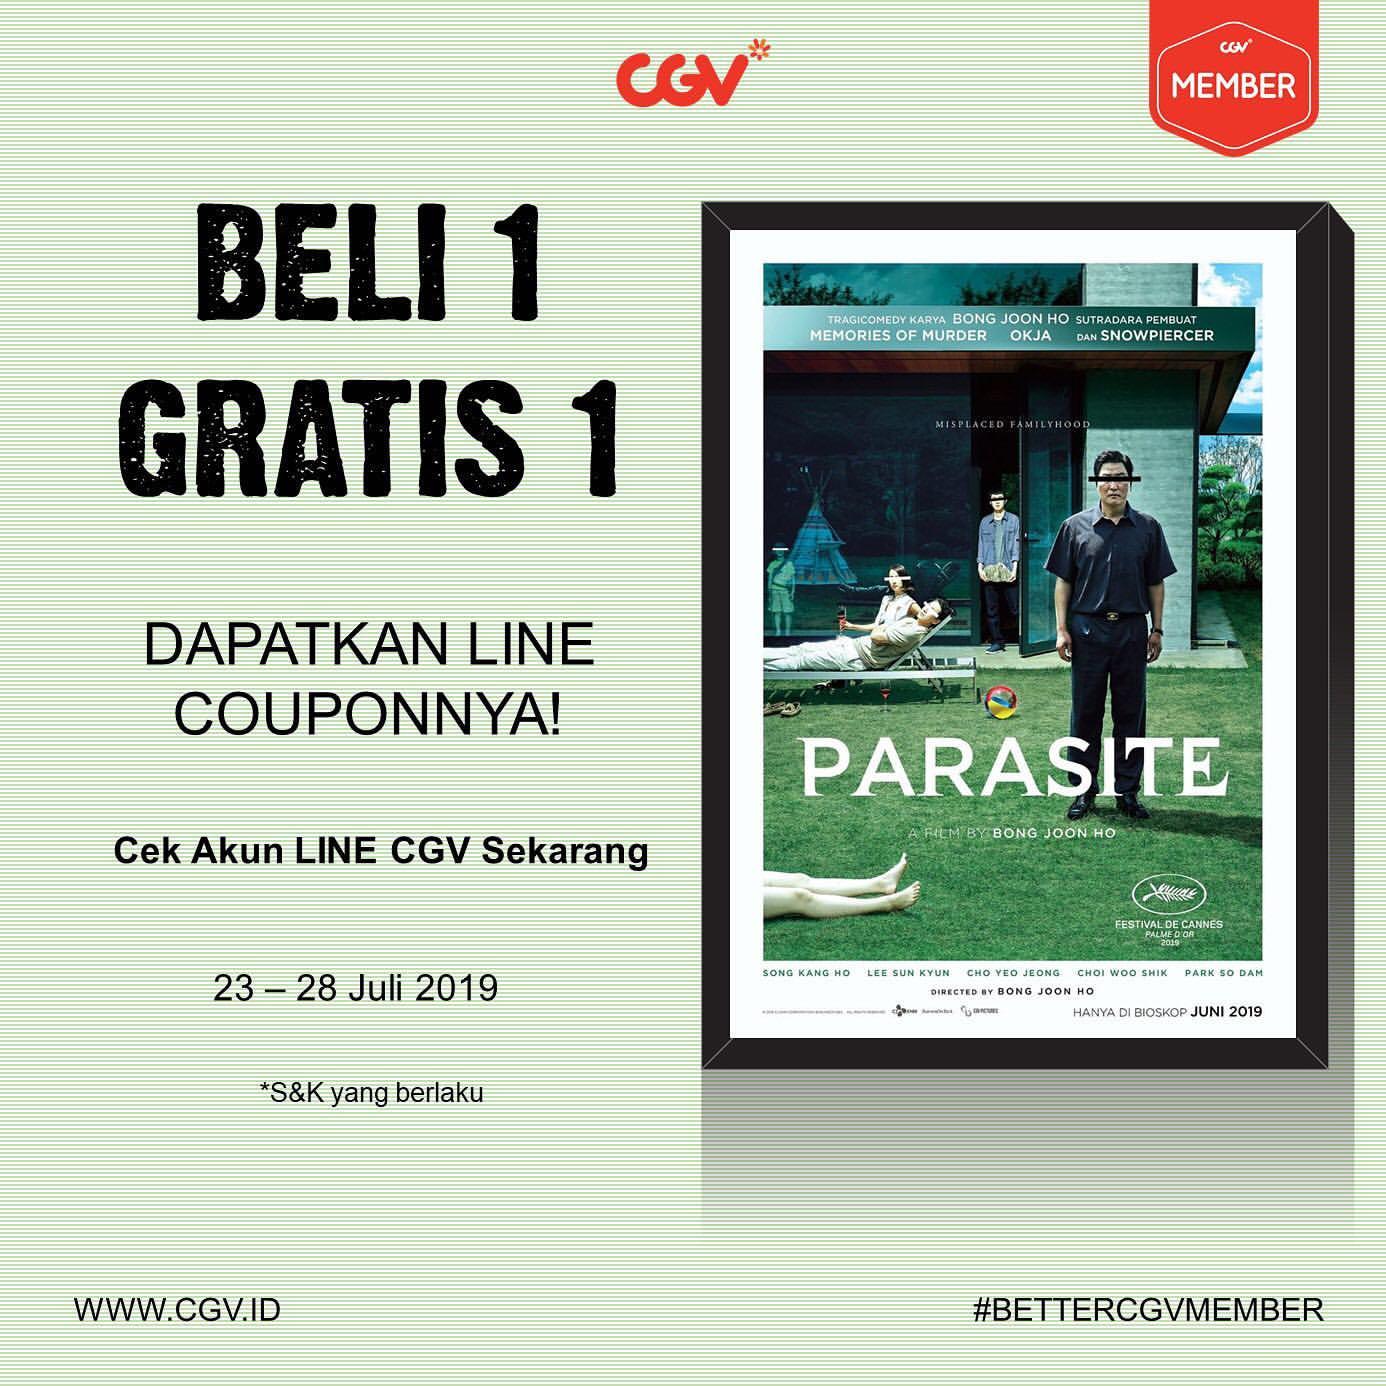 CGV Cinemas Promo Beli 1 Gratis 1*